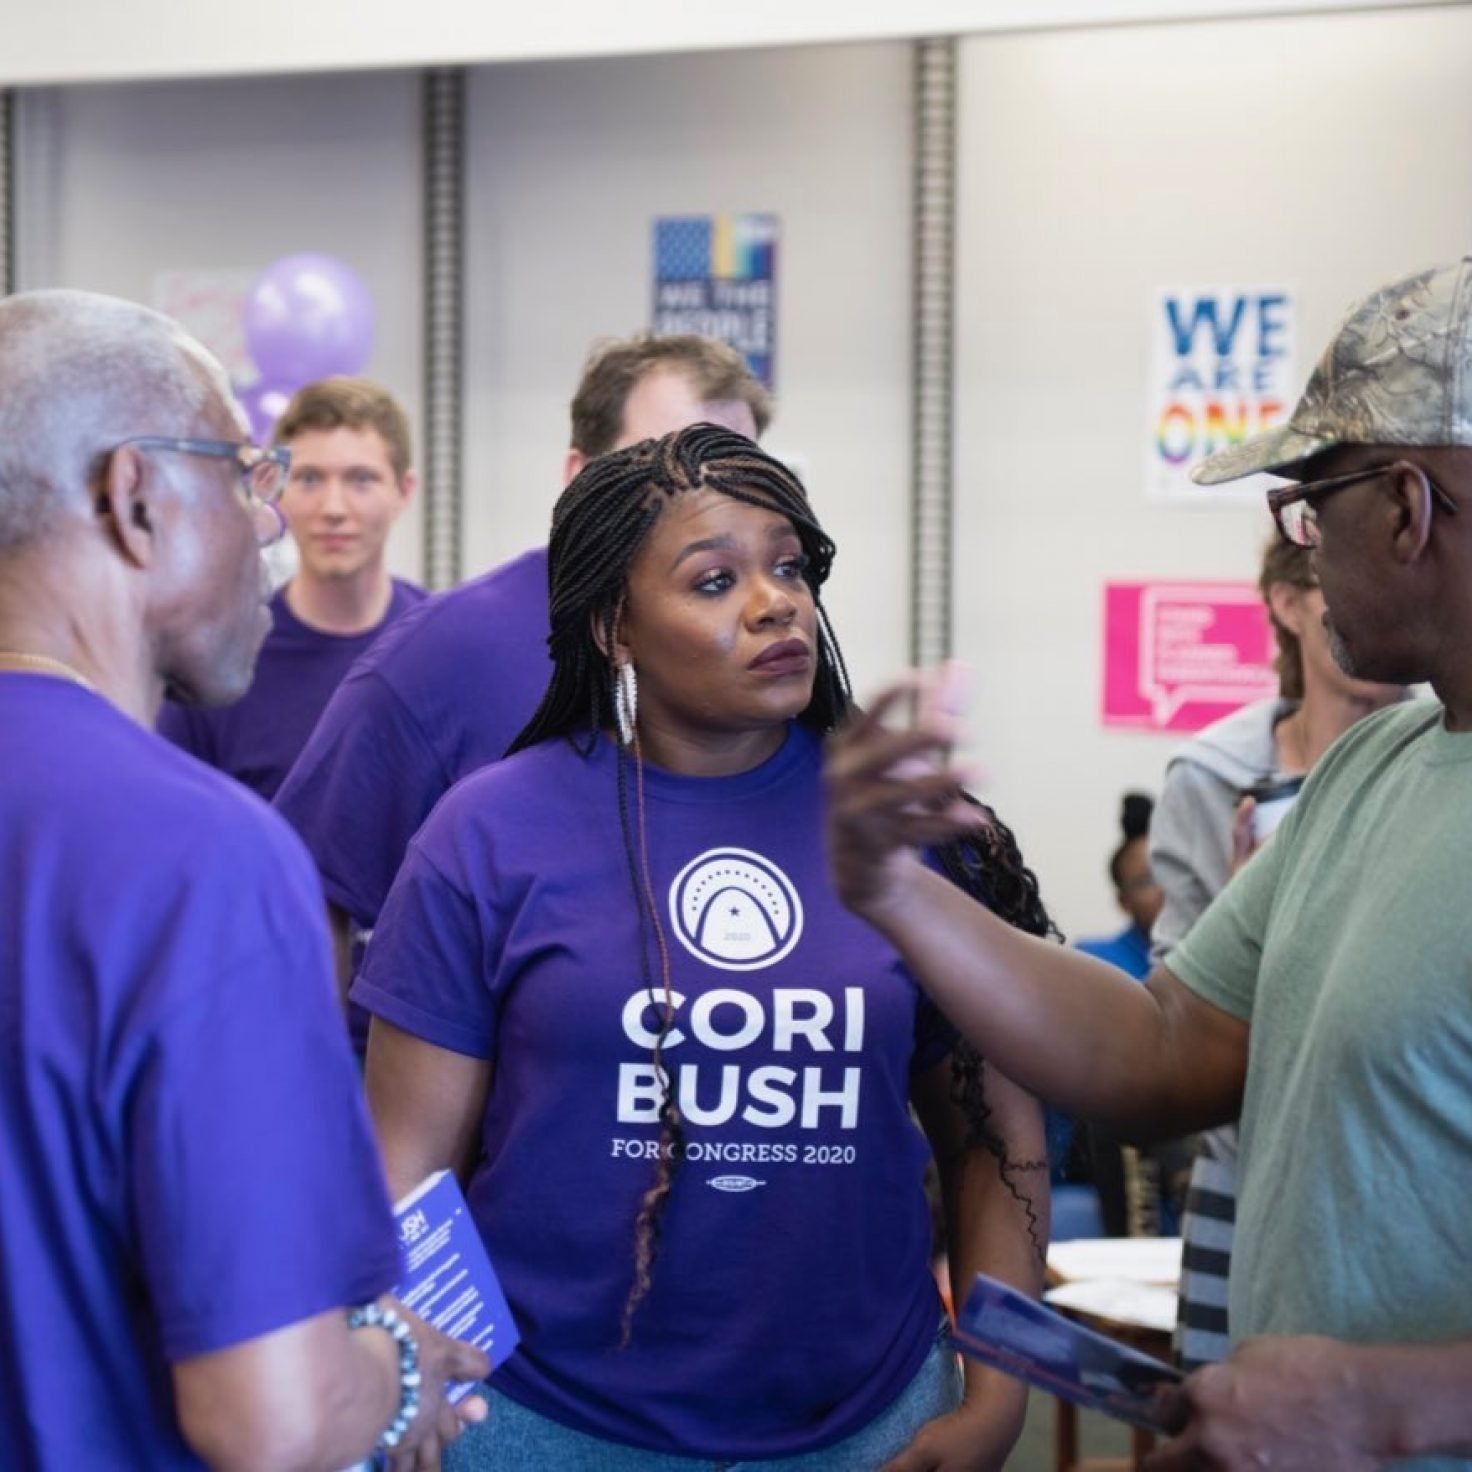 Activist Cori Bush Defeats 20-Year Incumbent In Missouri House Race